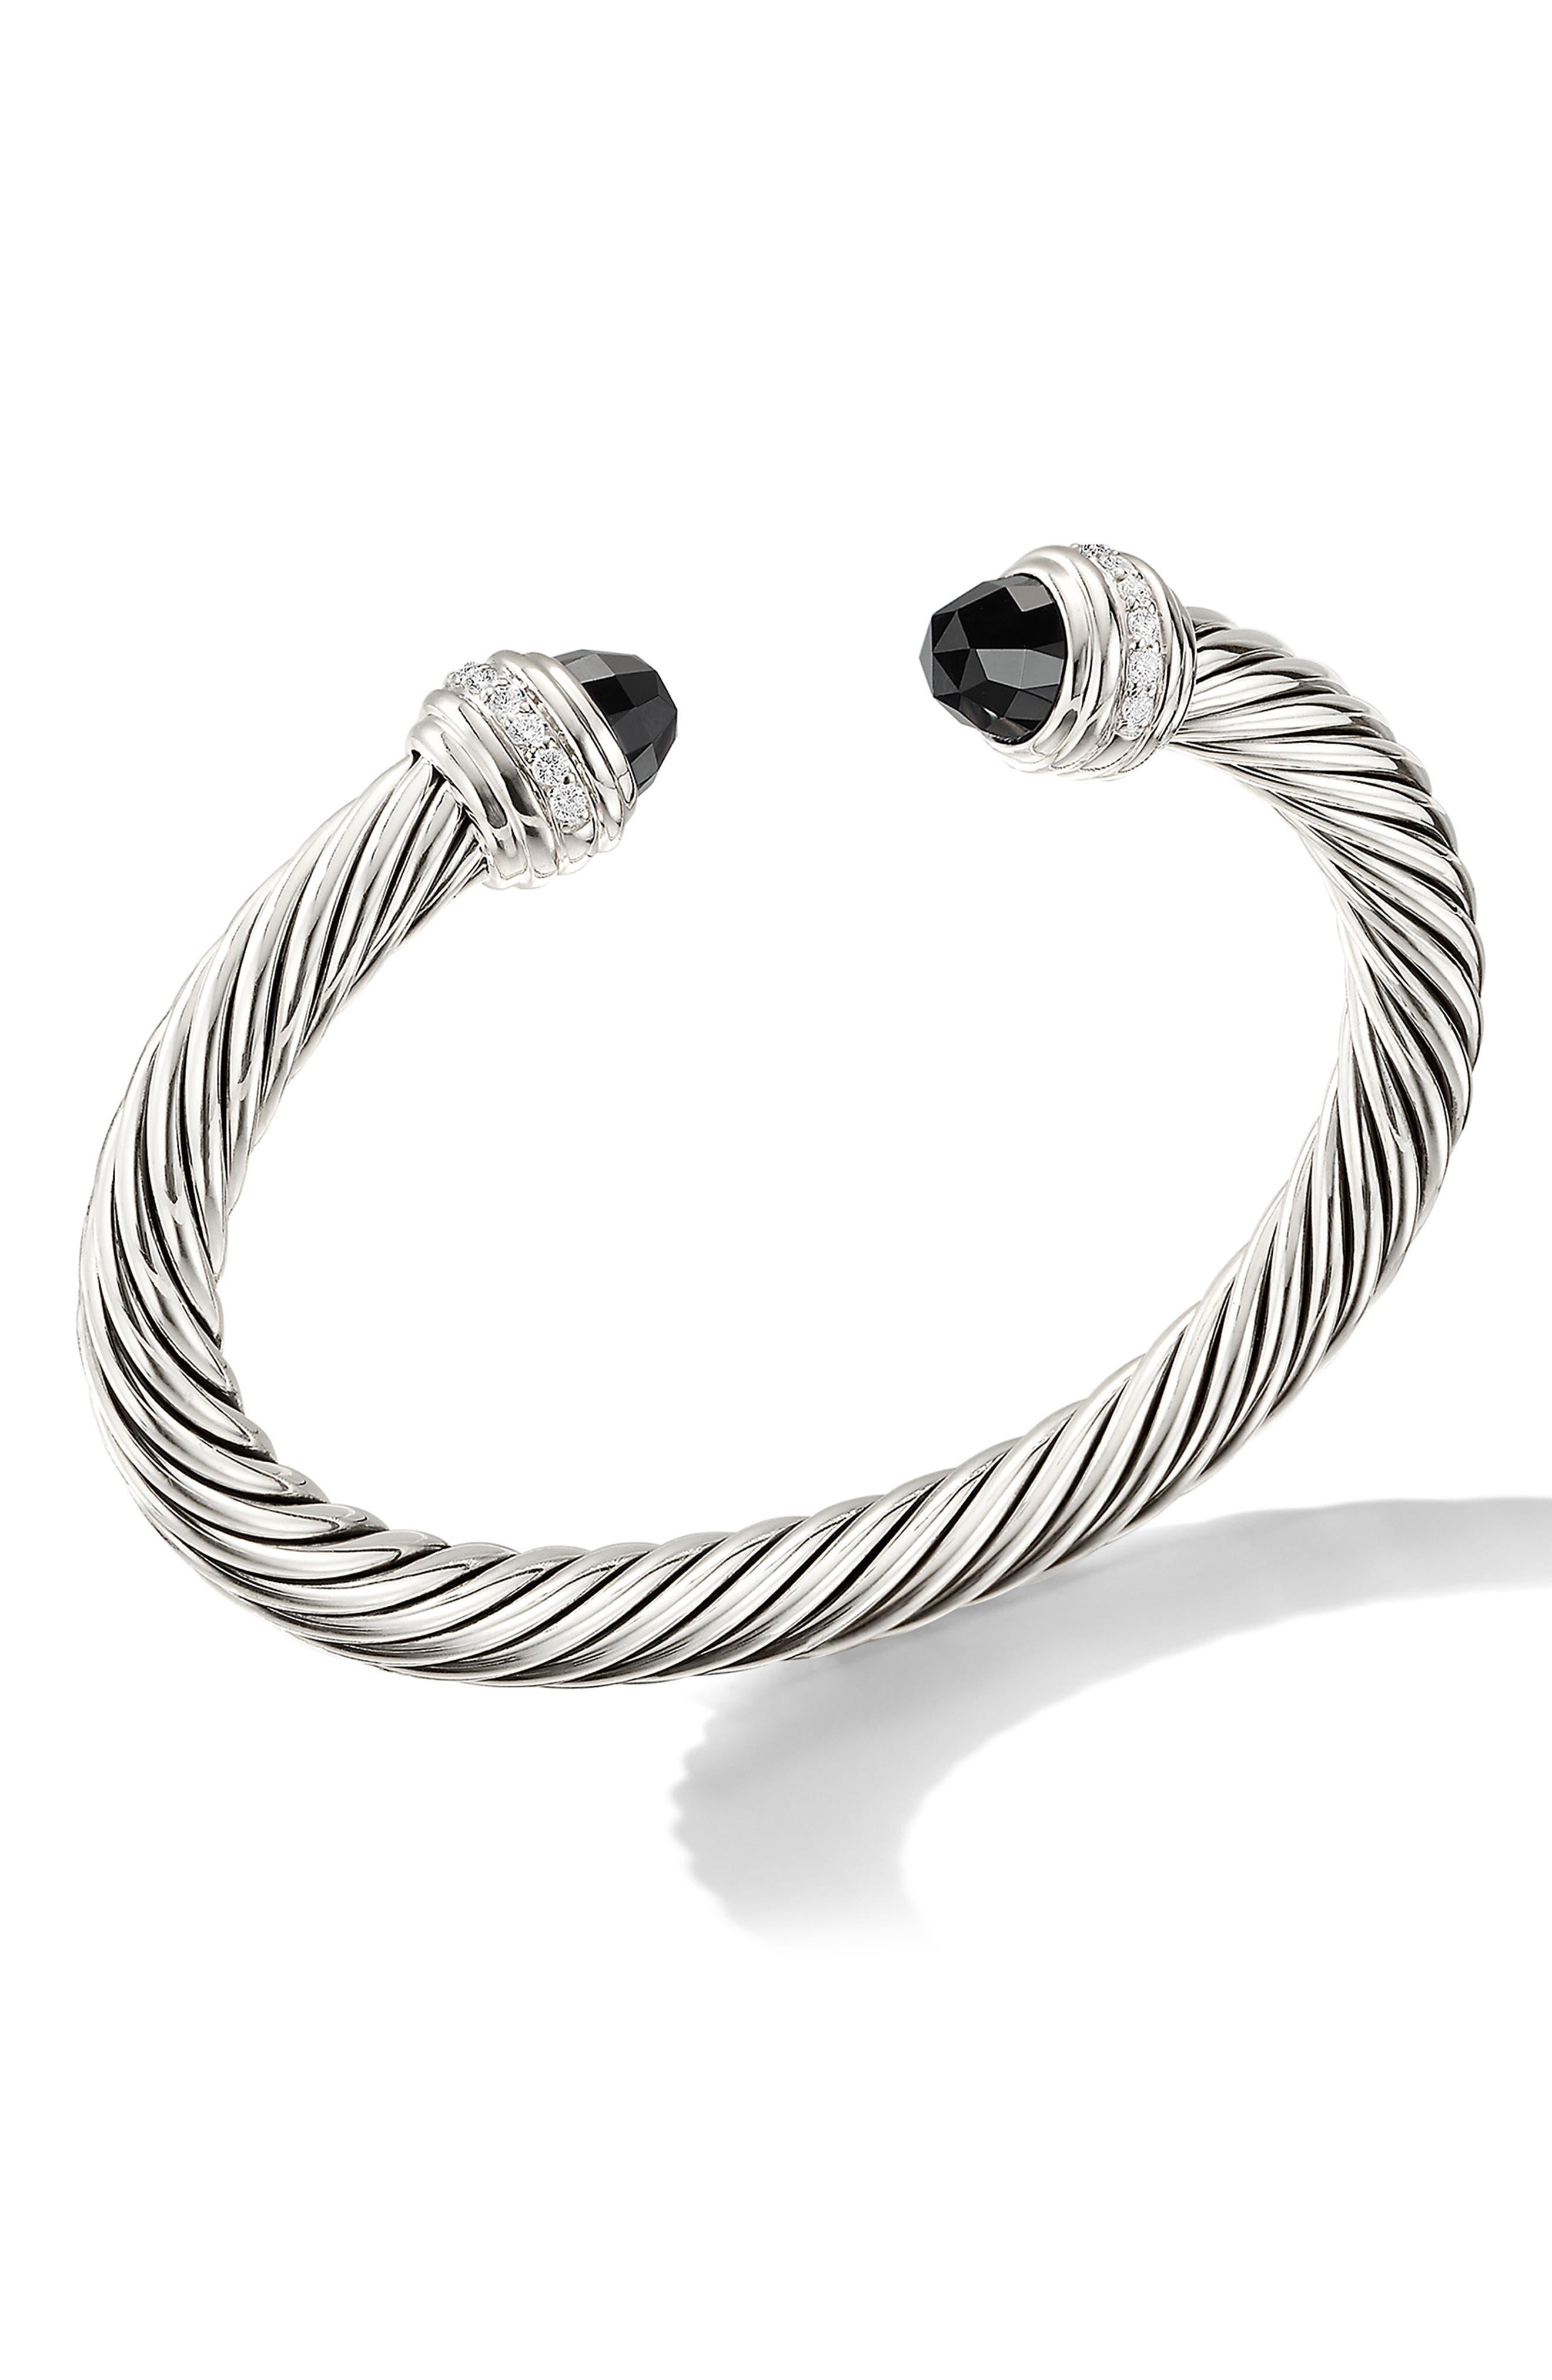 DAVID YURMAN, Cable Classics Bracelet with Semiprecious Stones & Diamonds, 7mm, Main thumbnail 1, color, SILVER/ DIAMOND/ BLACK ONYX